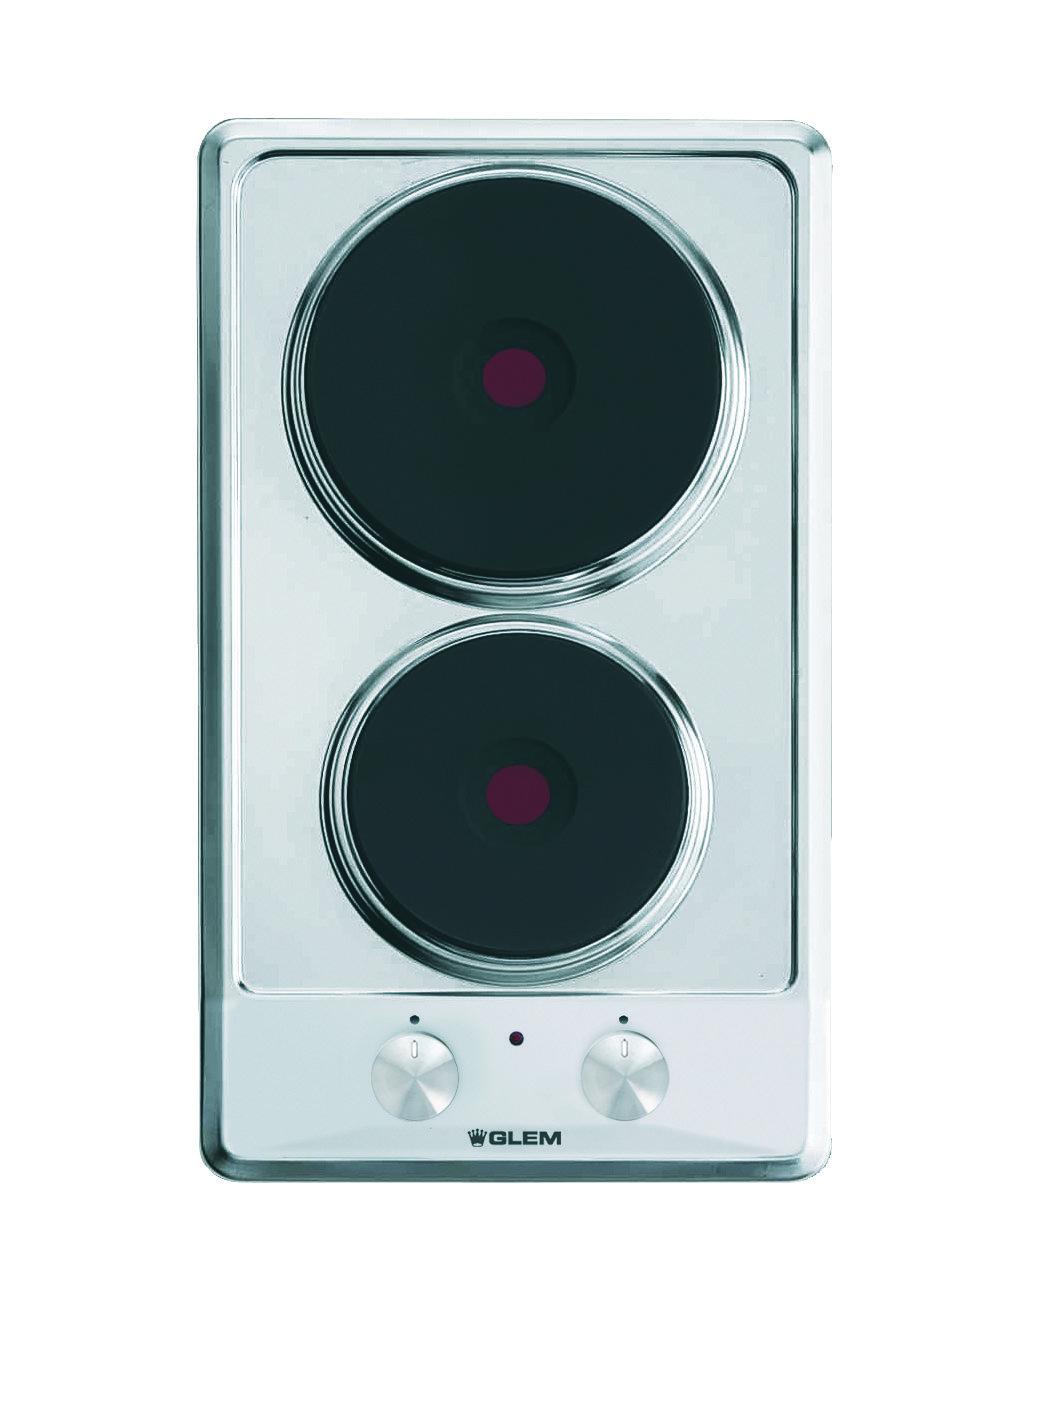 Piano cottura a induzione a gas o elettrico cose di casa - Piastre elettriche a induzione ...